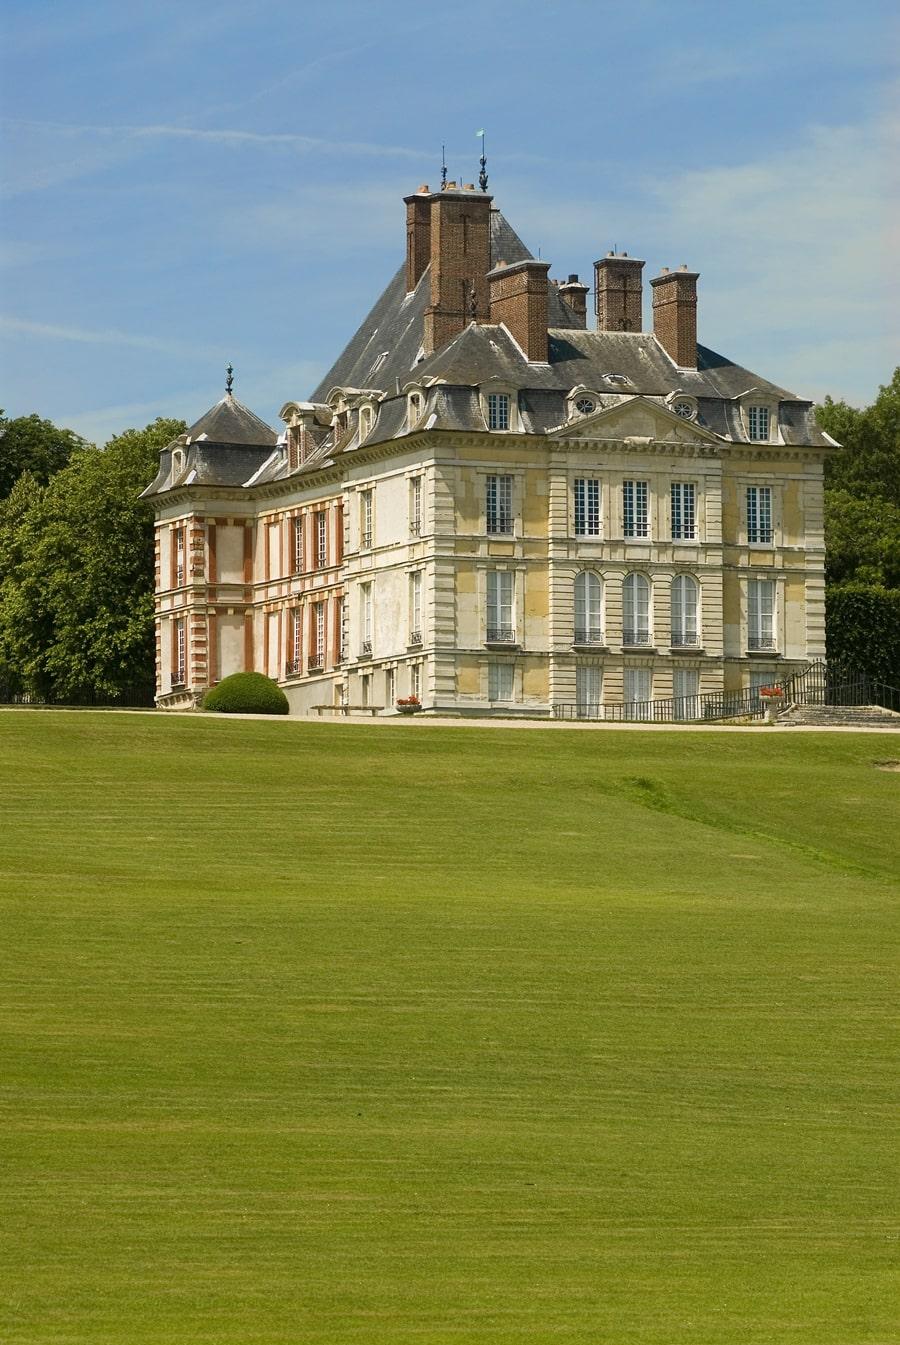 Chateau-Ormesson-2-2